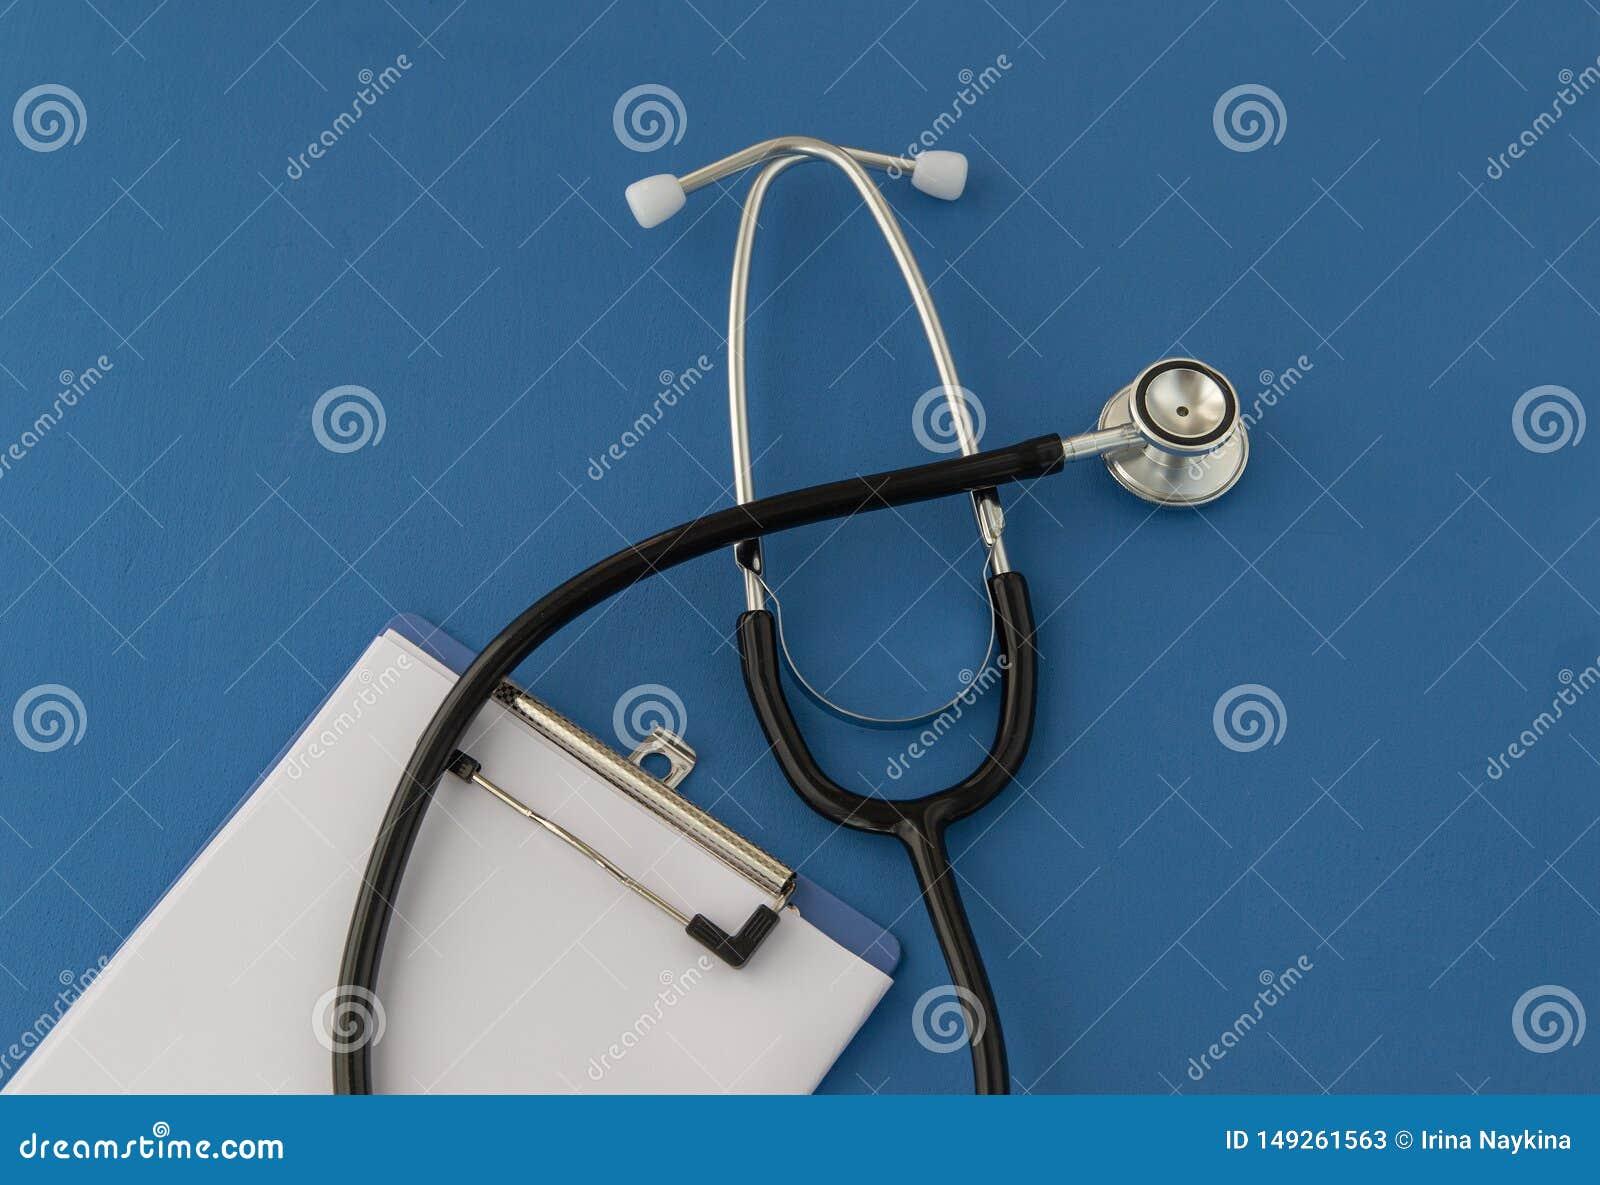 Stethoscope, prescription, on blue background. The concept of medicine.